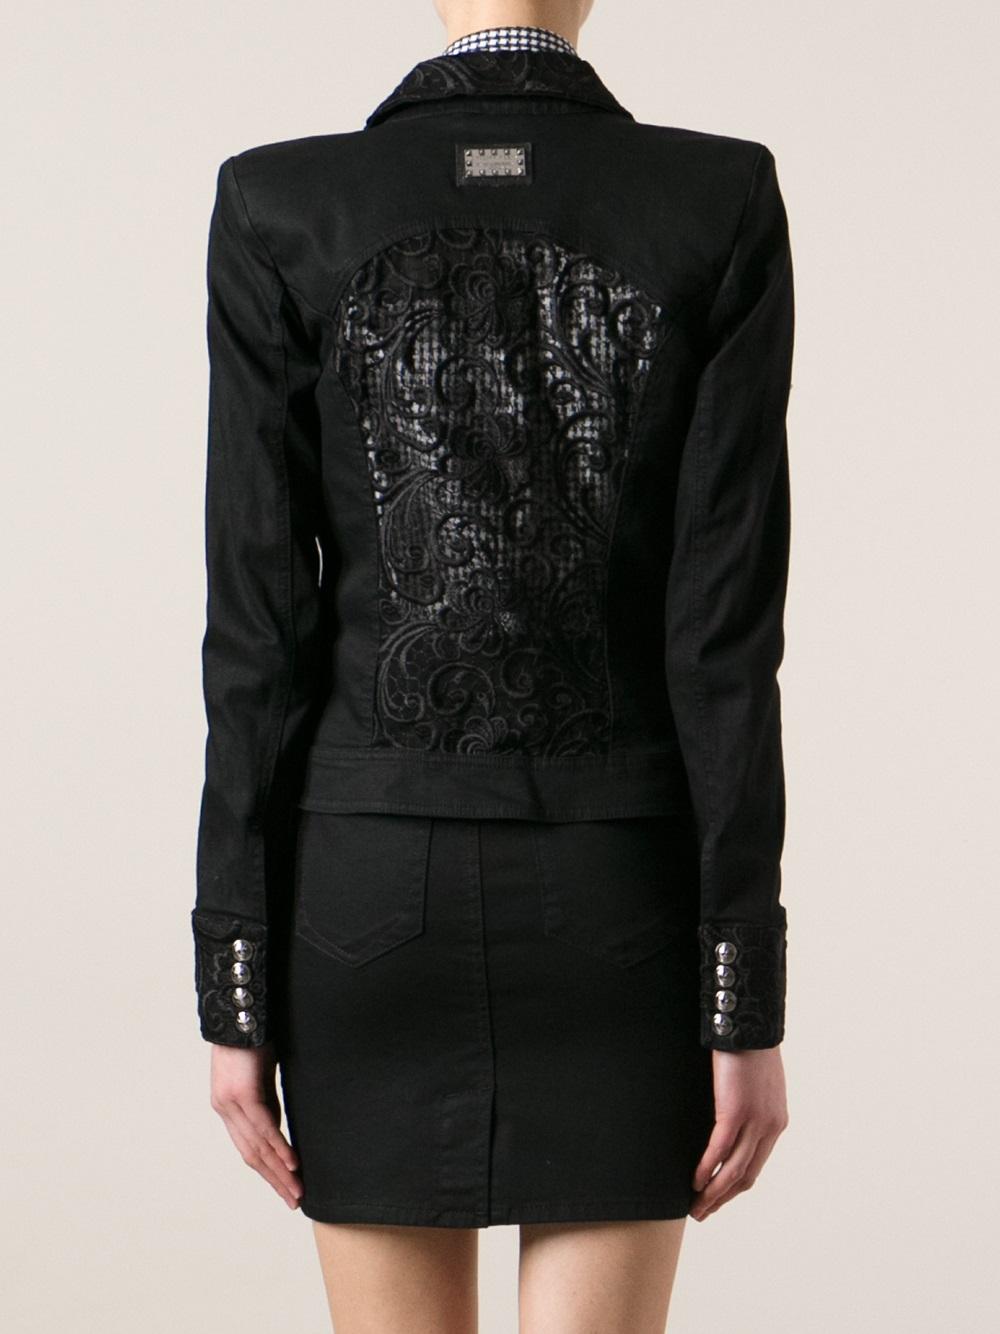 Black Anorak Jacket Women S